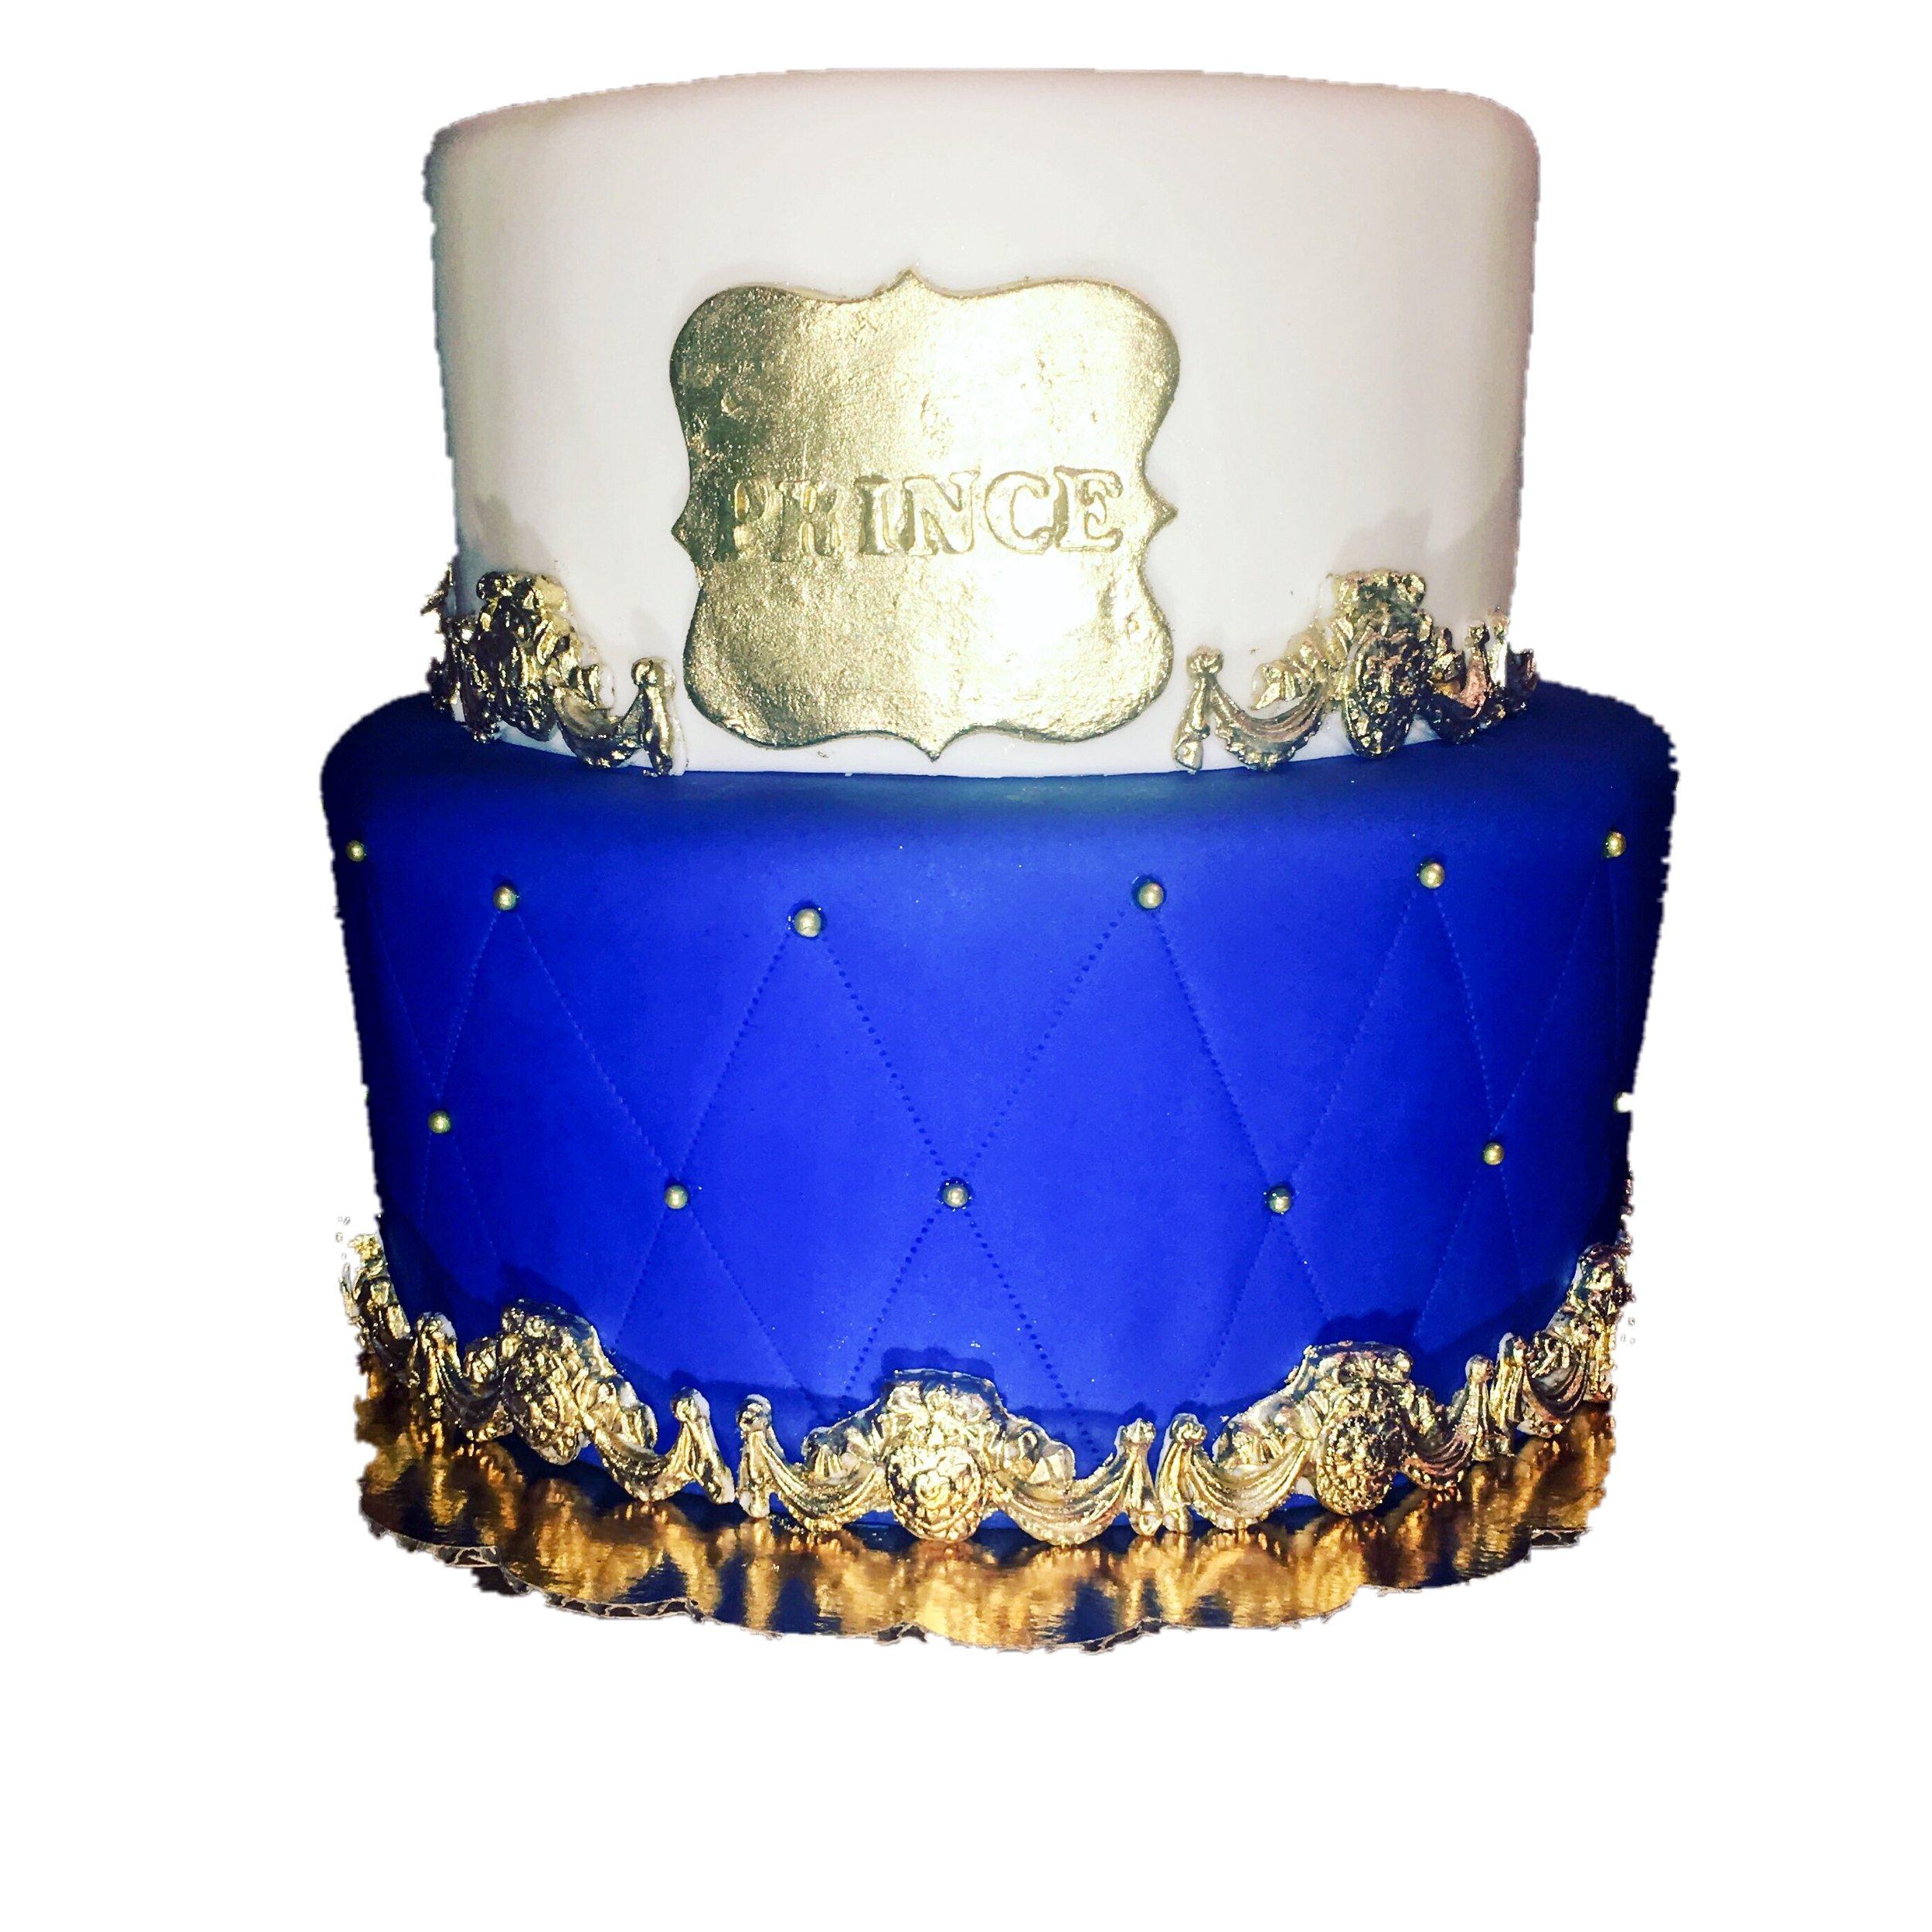 Prince shower cake